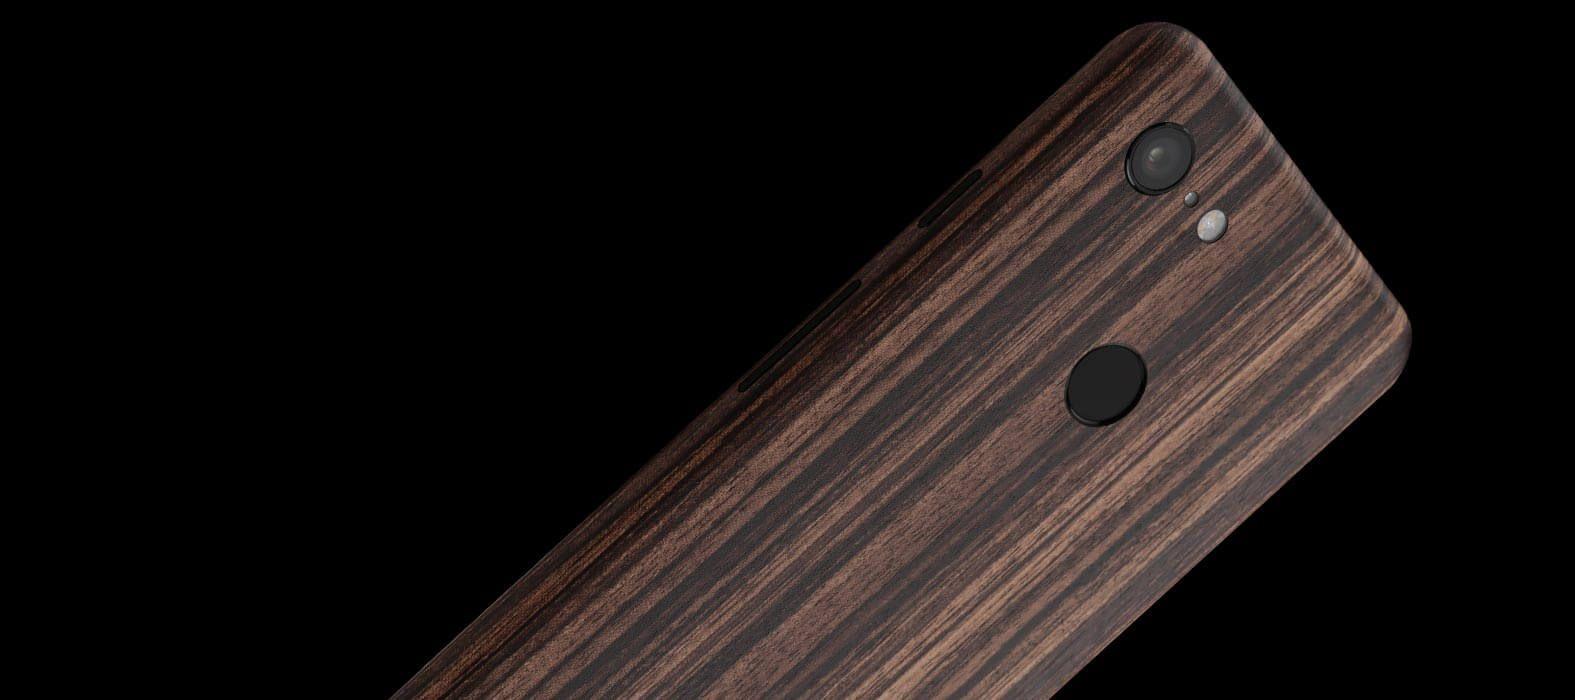 Pixel-3-XL_Zebra-Wood_Skins